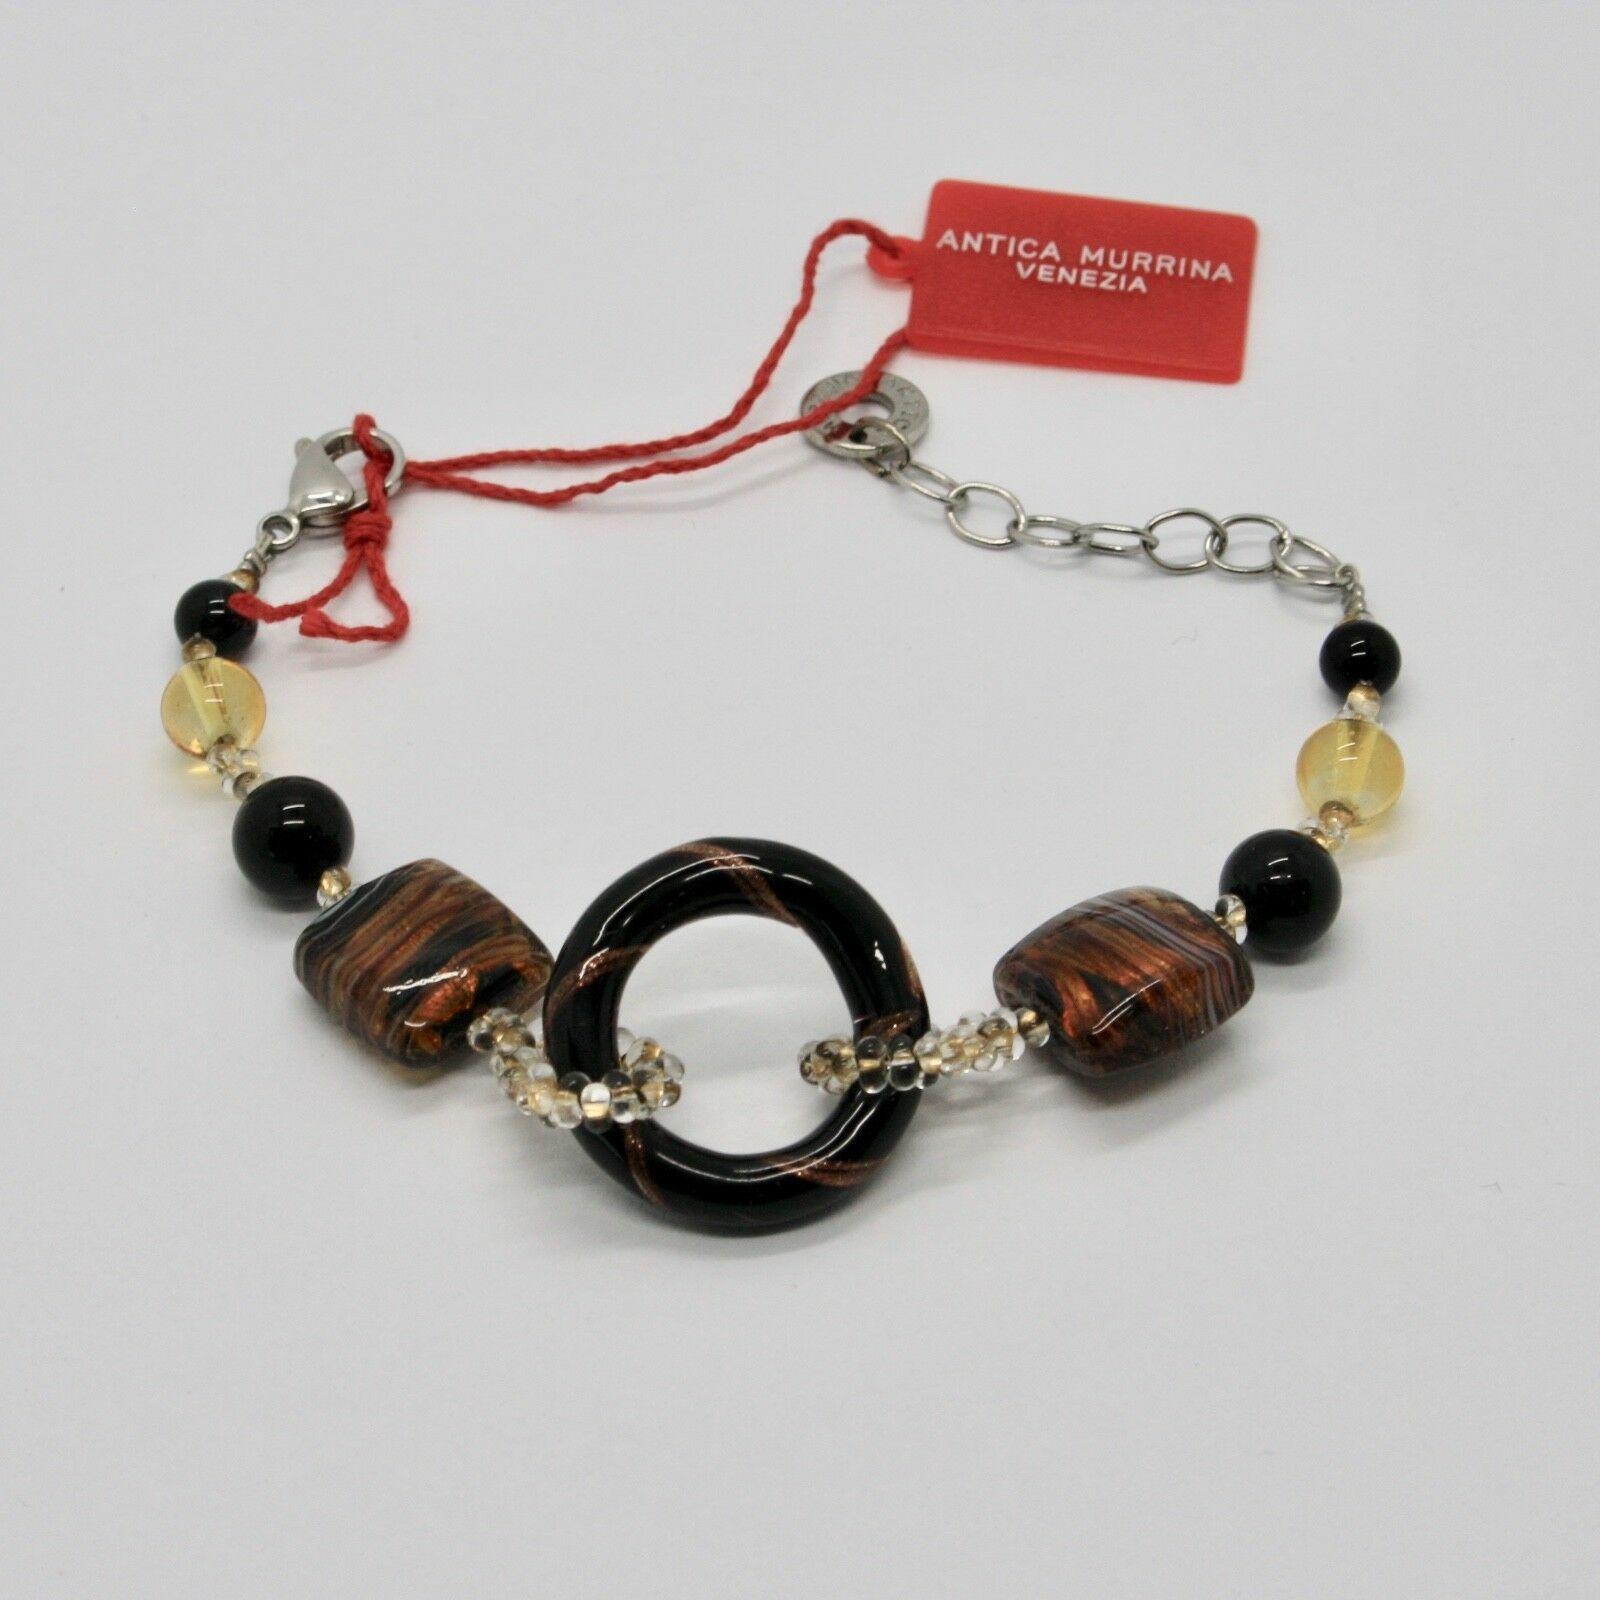 BRACELET ANTICA MURRINA VENEZIA WITH MURANO GLASS BROWN BLACK BEIGE BR567A14